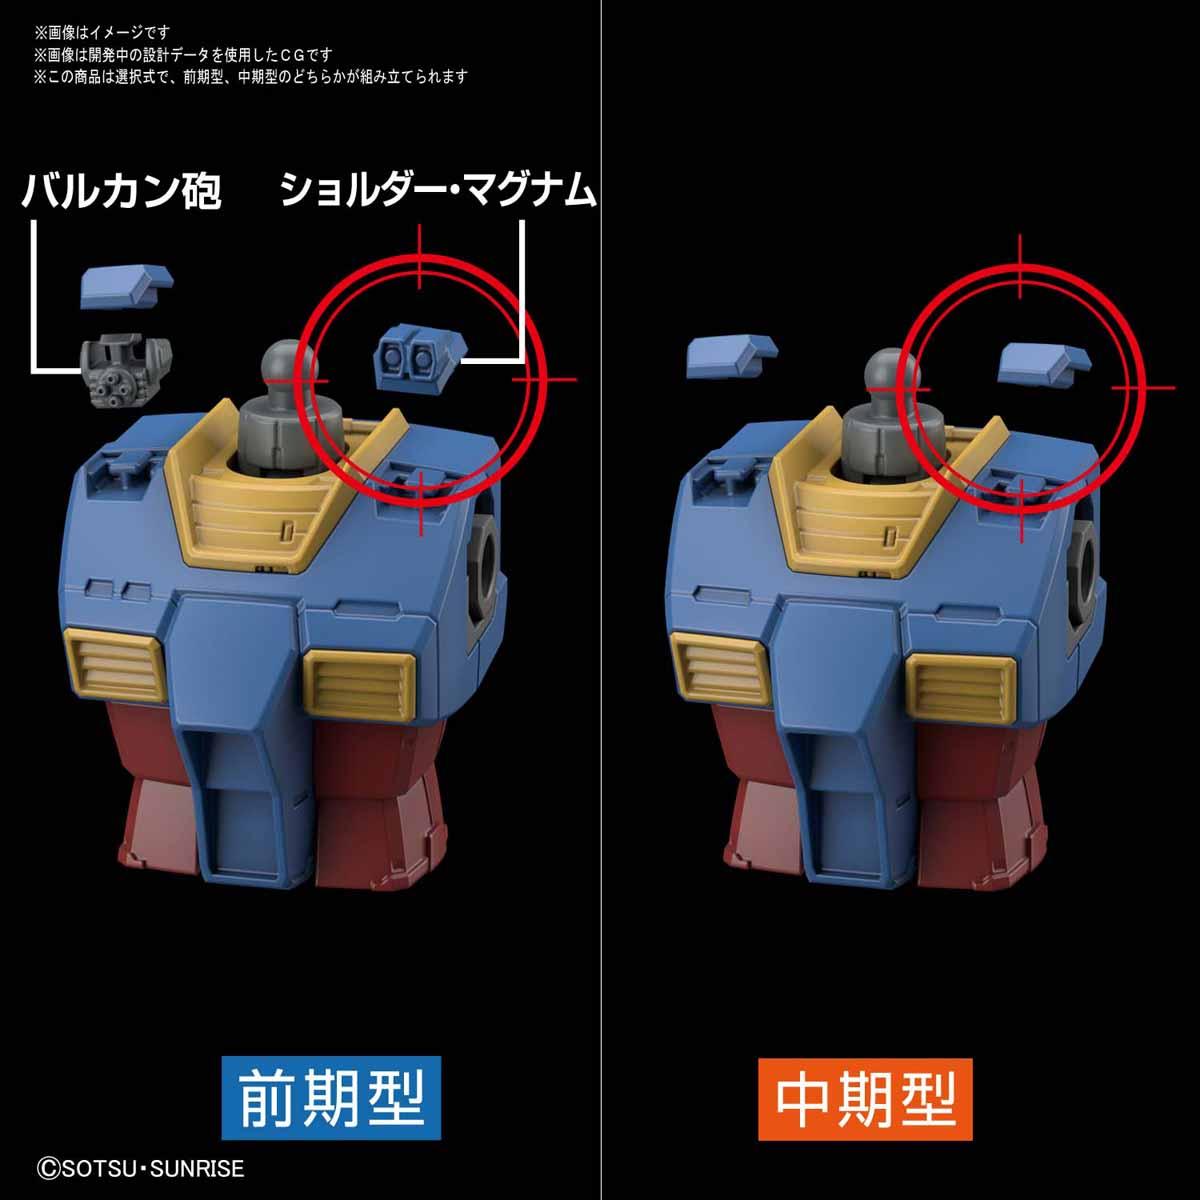 HG 1/144『RX-78-02 ガンダム(GUNDAM THE ORIGIN版)』プラモデル-005